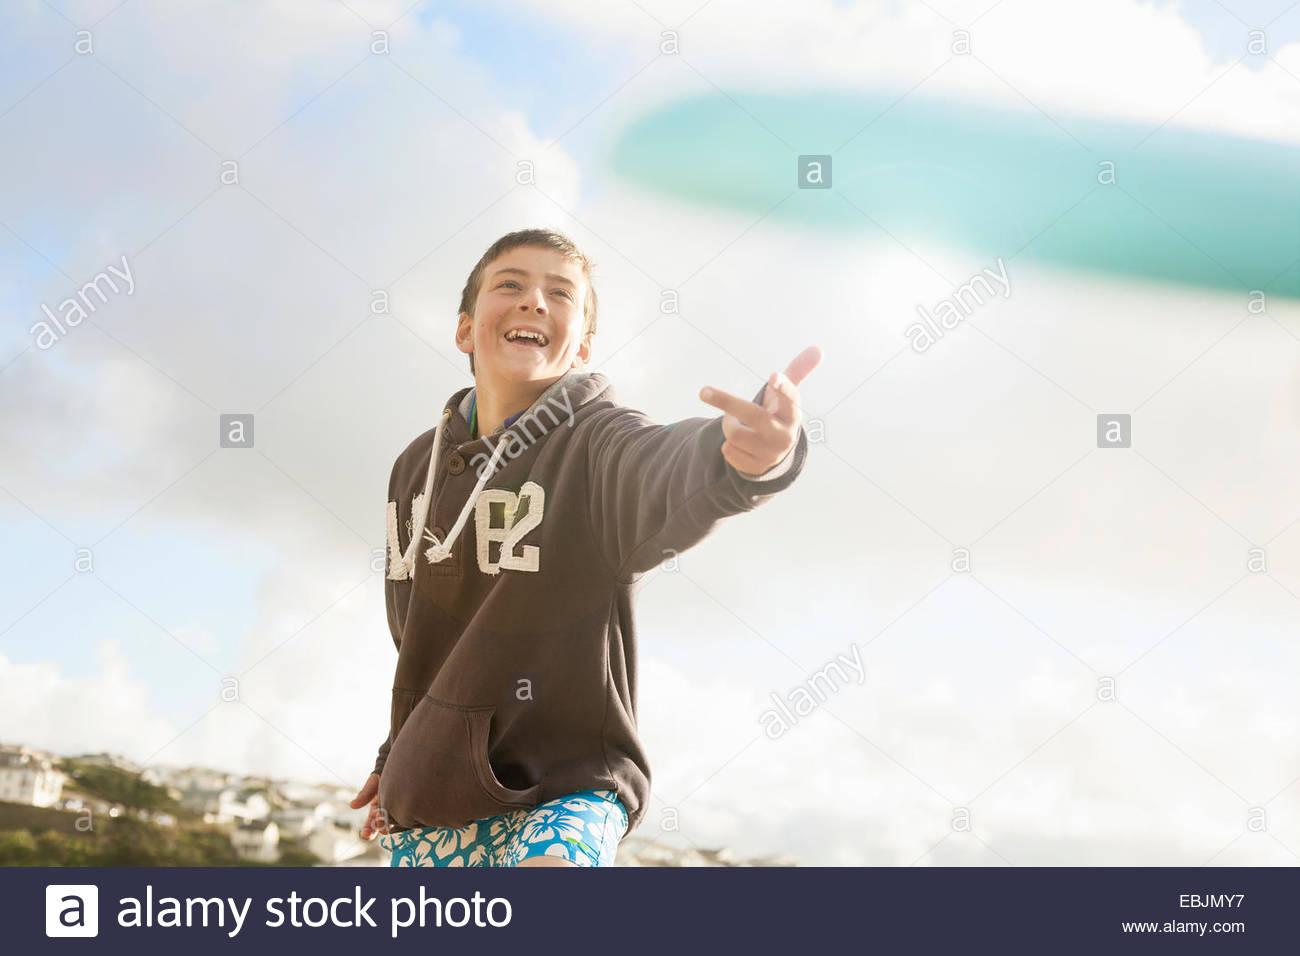 Boy wearing sweater, smiling Photo Stock